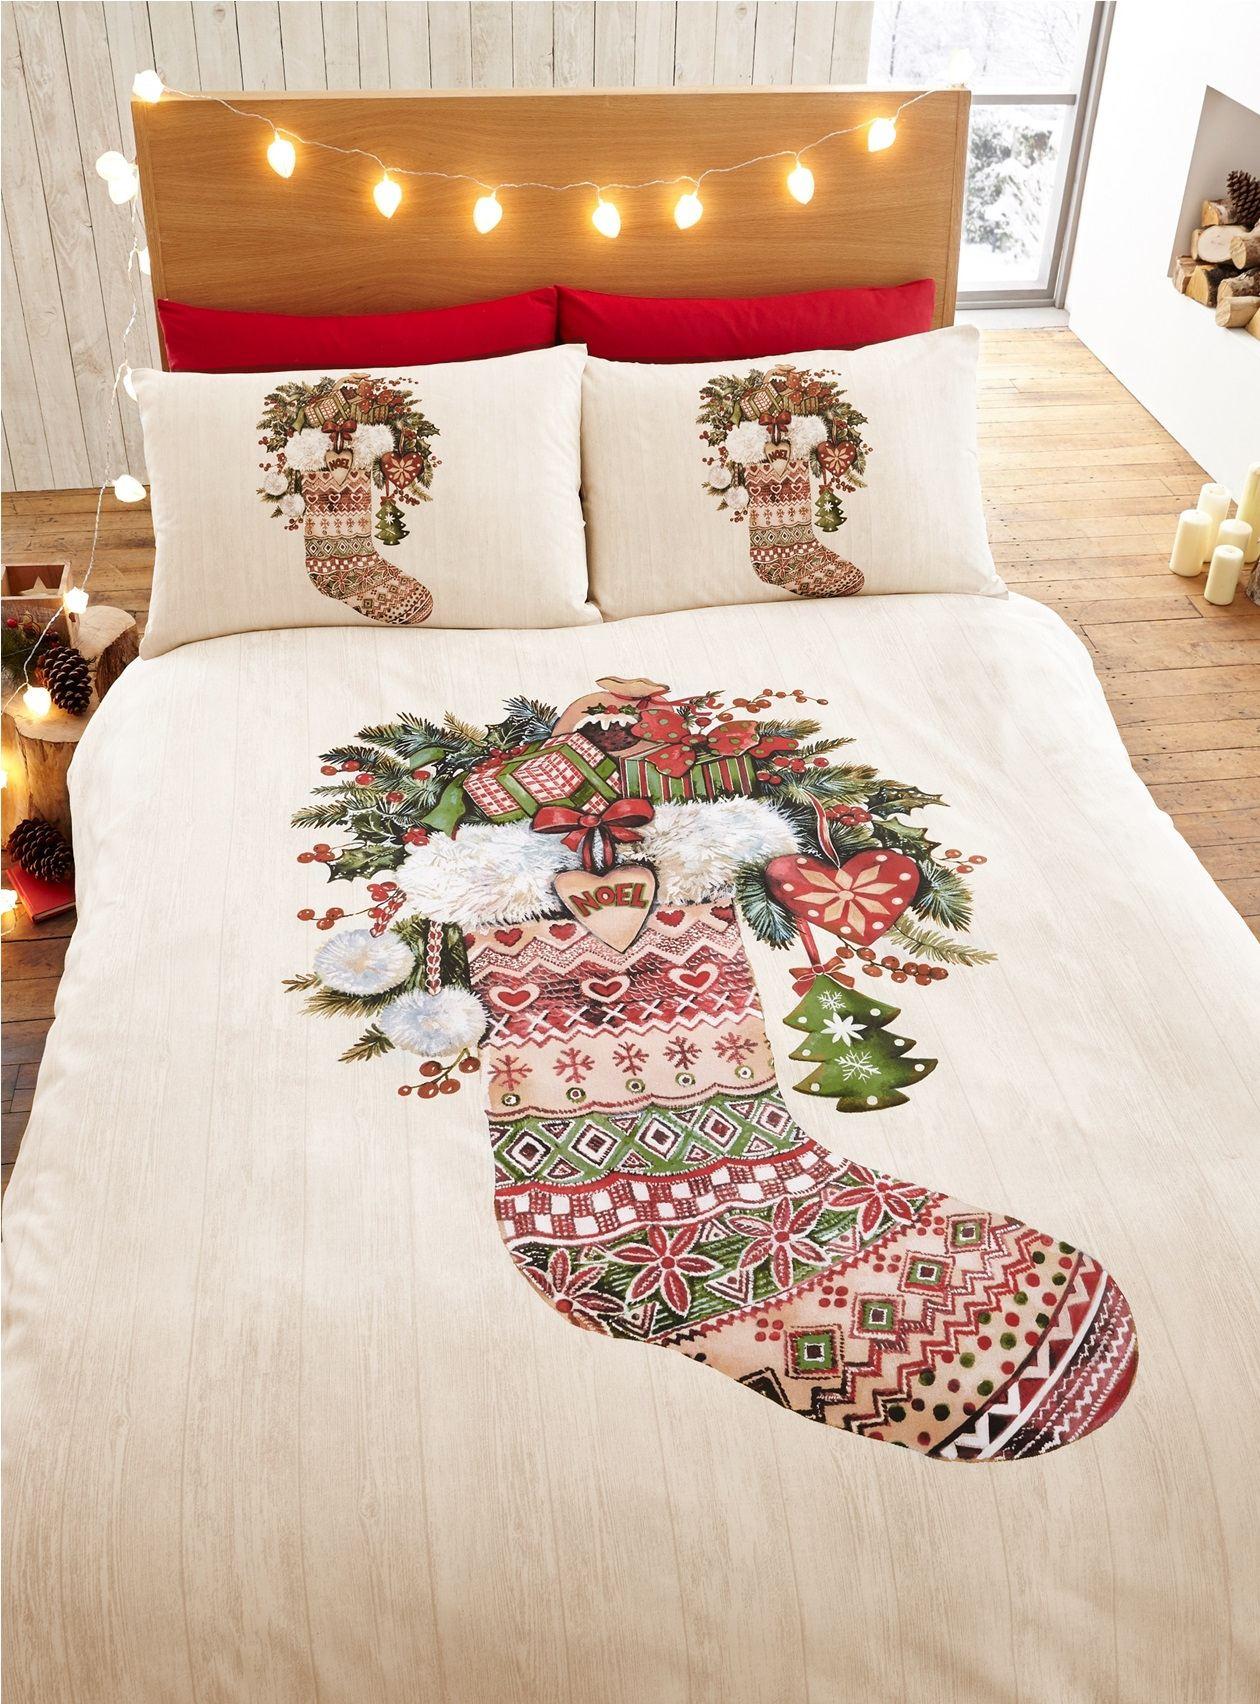 Christmas kids quilt duvet cover bedding bed sets sizes